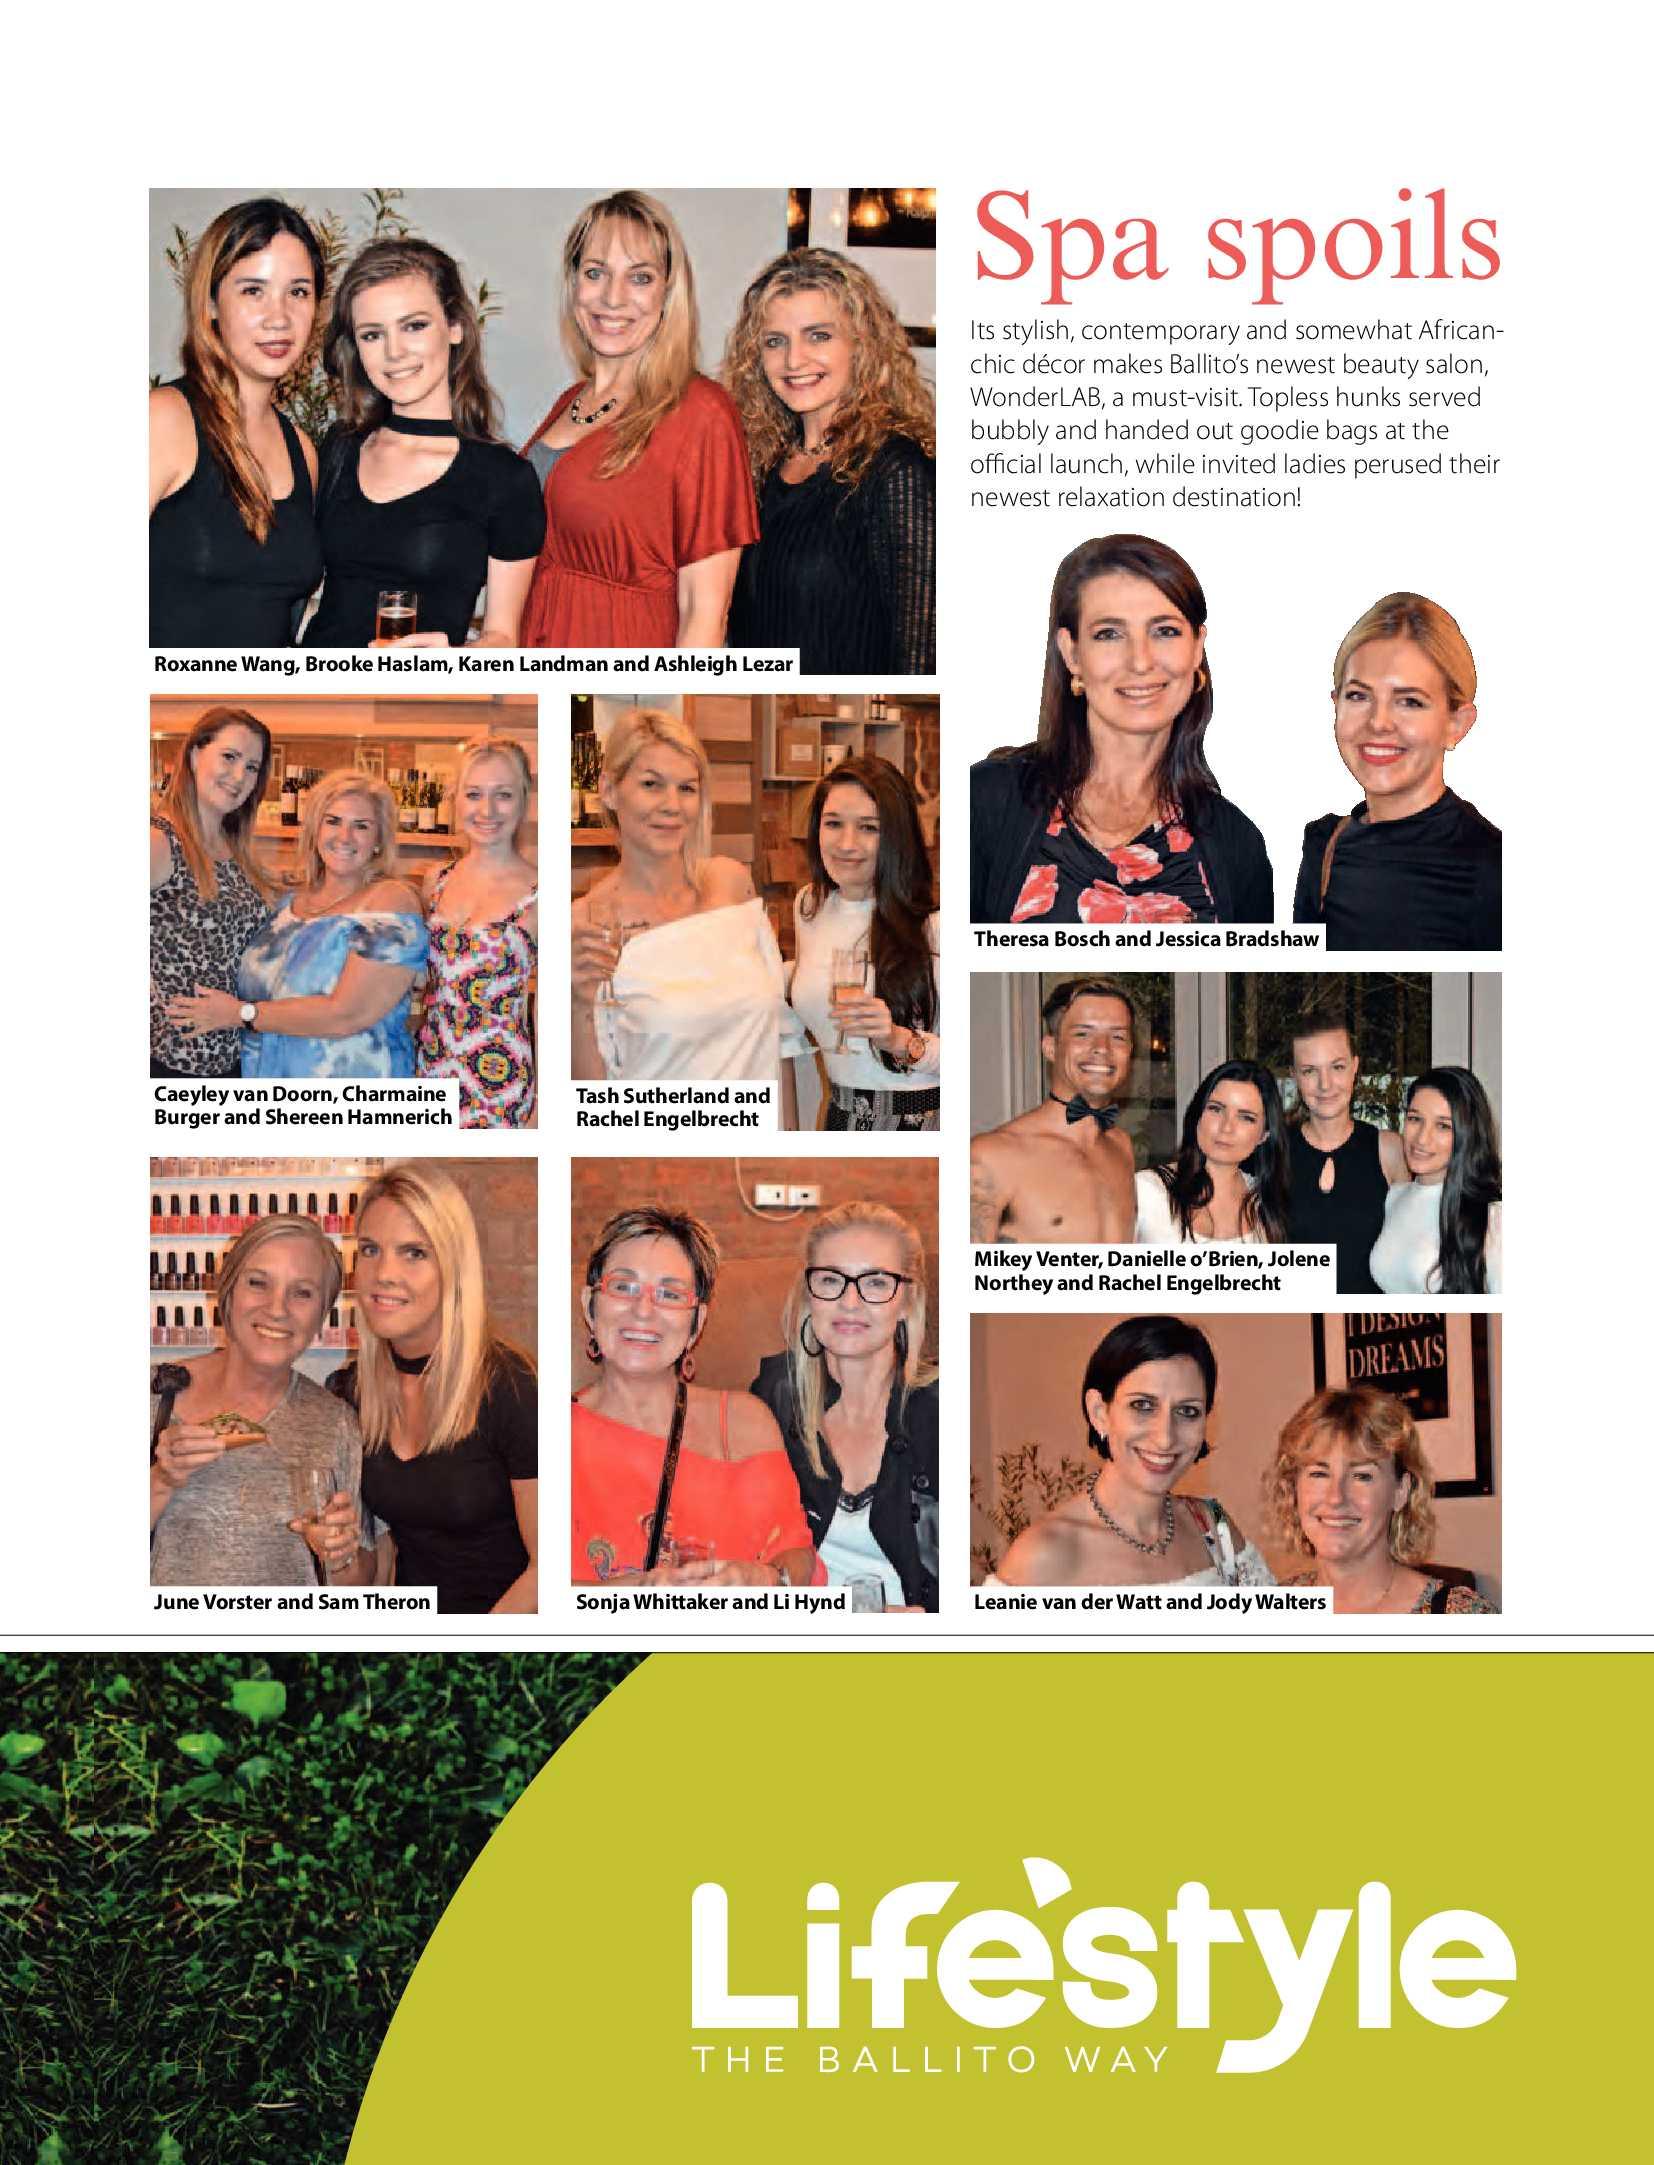 get-magazine-ballitoumhlanga-november-2017-2-epapers-page-15